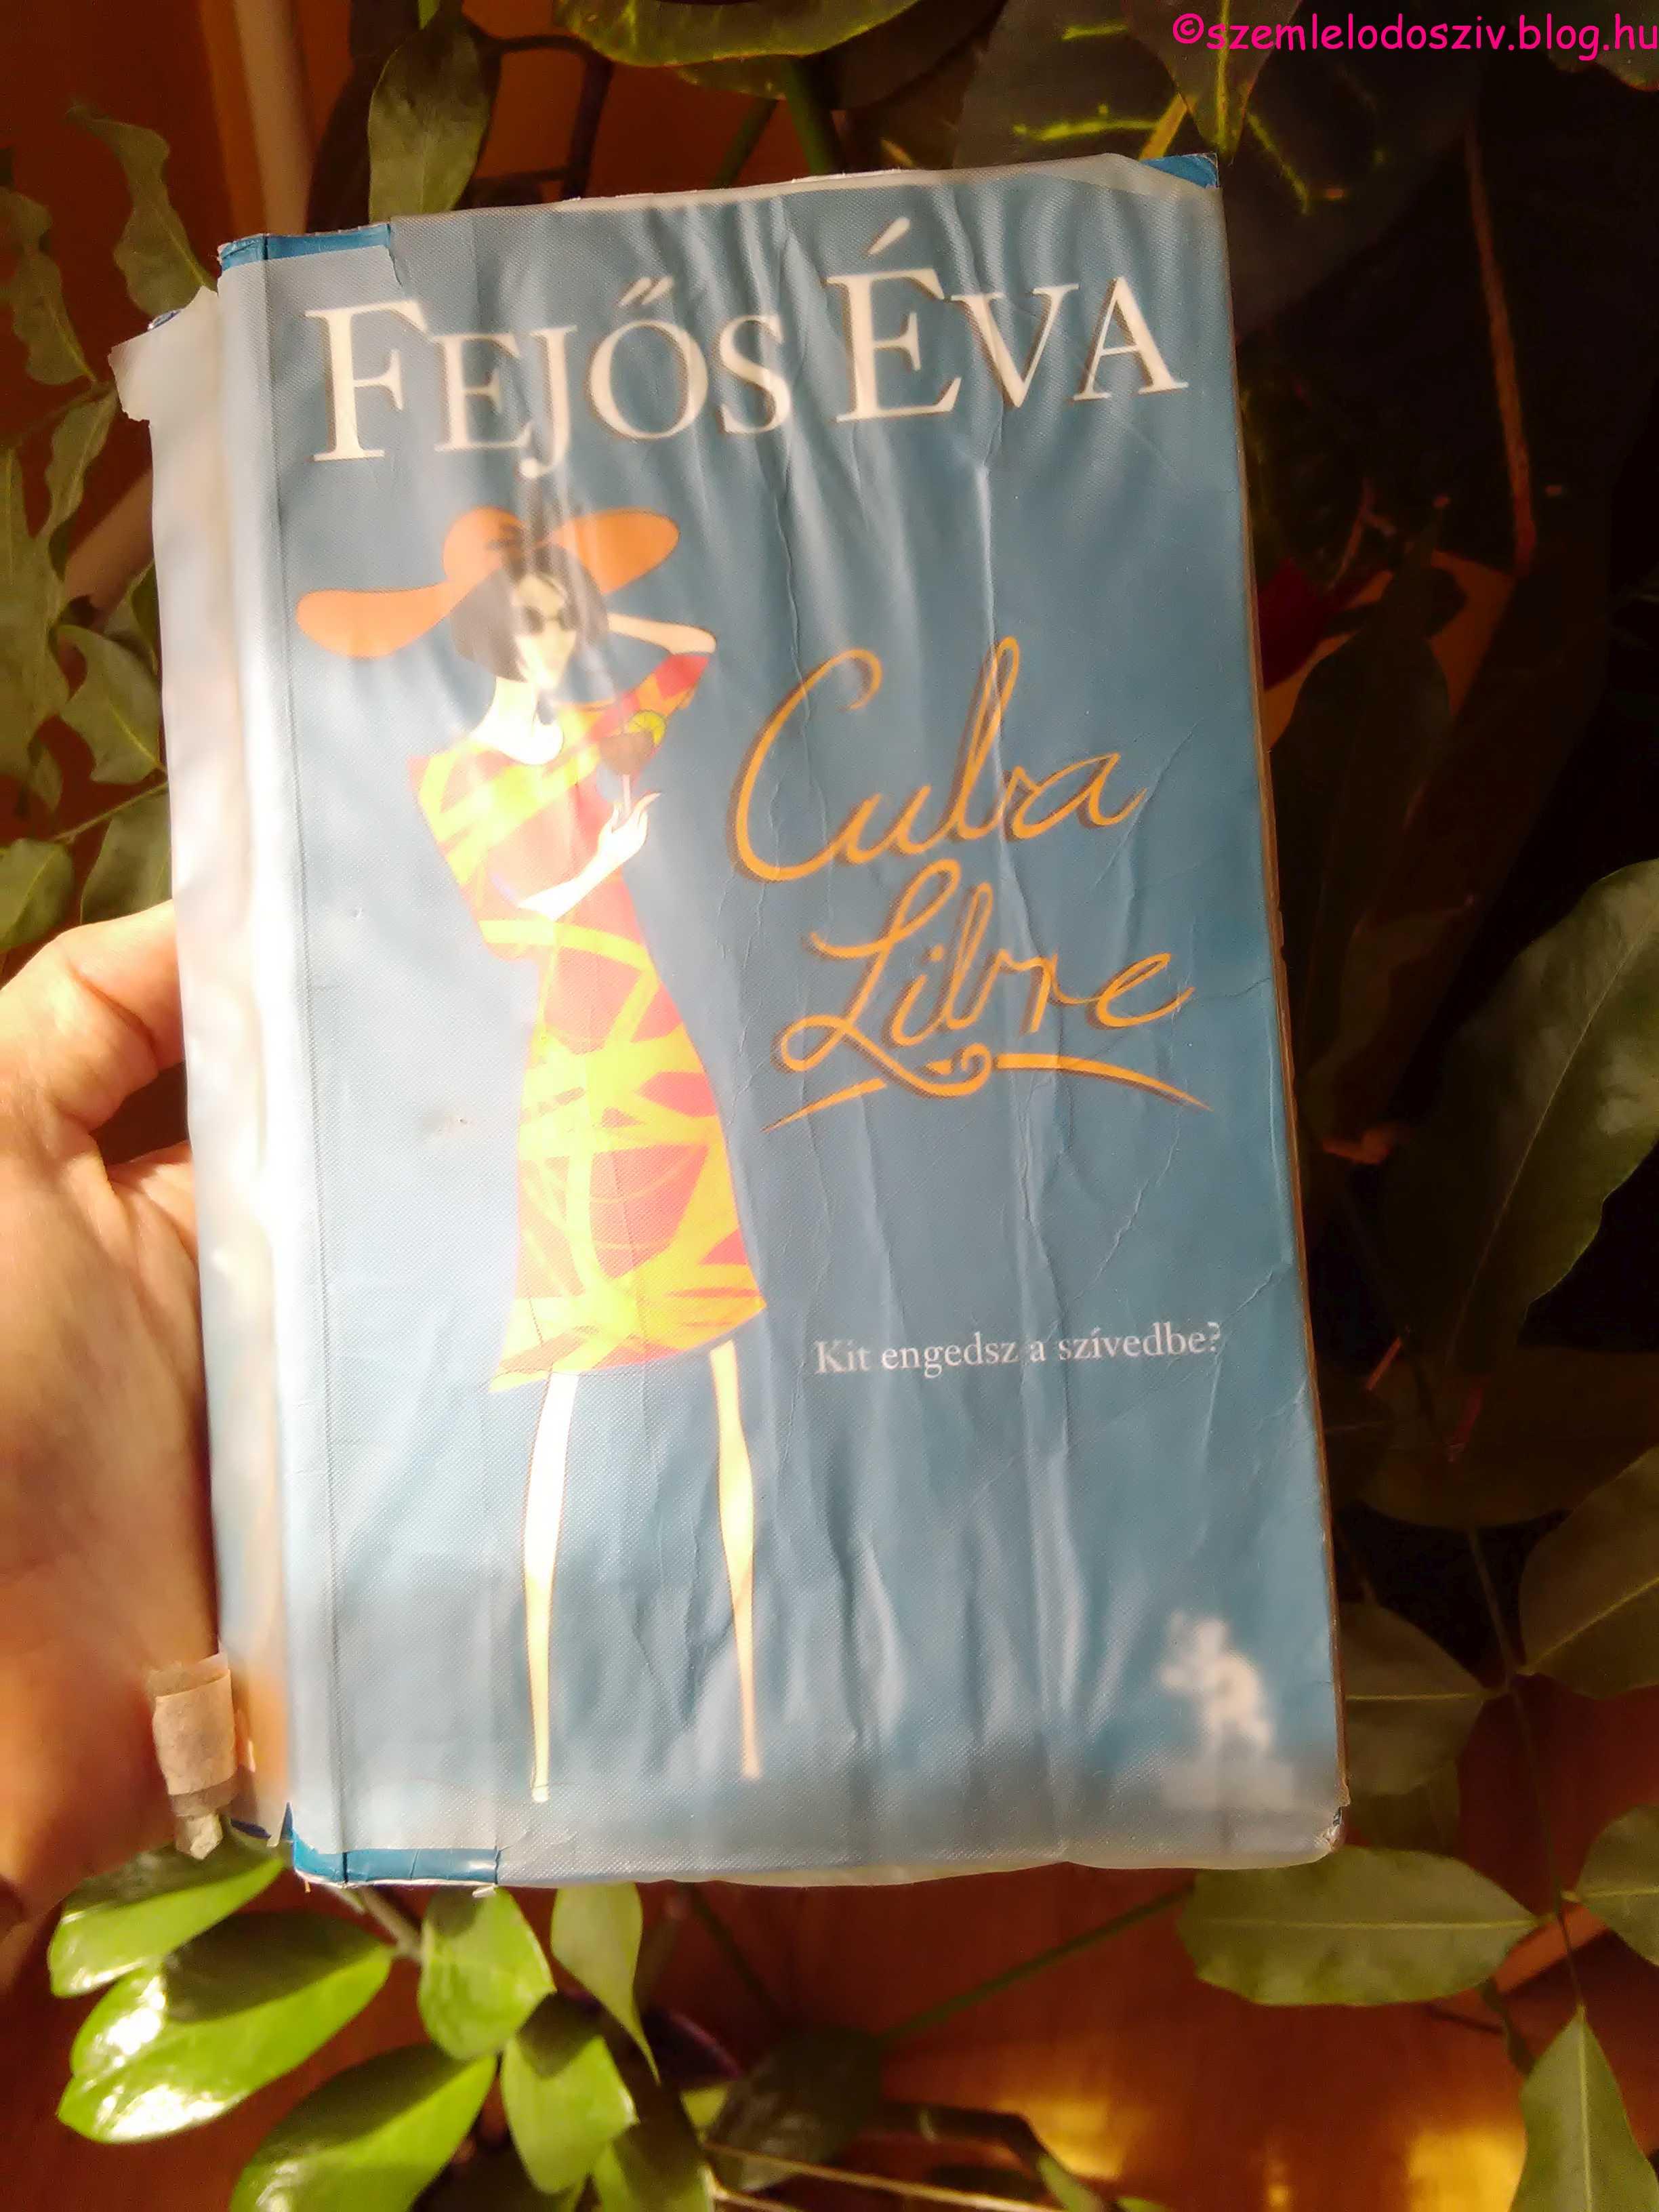 fejoseva_cuba_cimlap.jpg